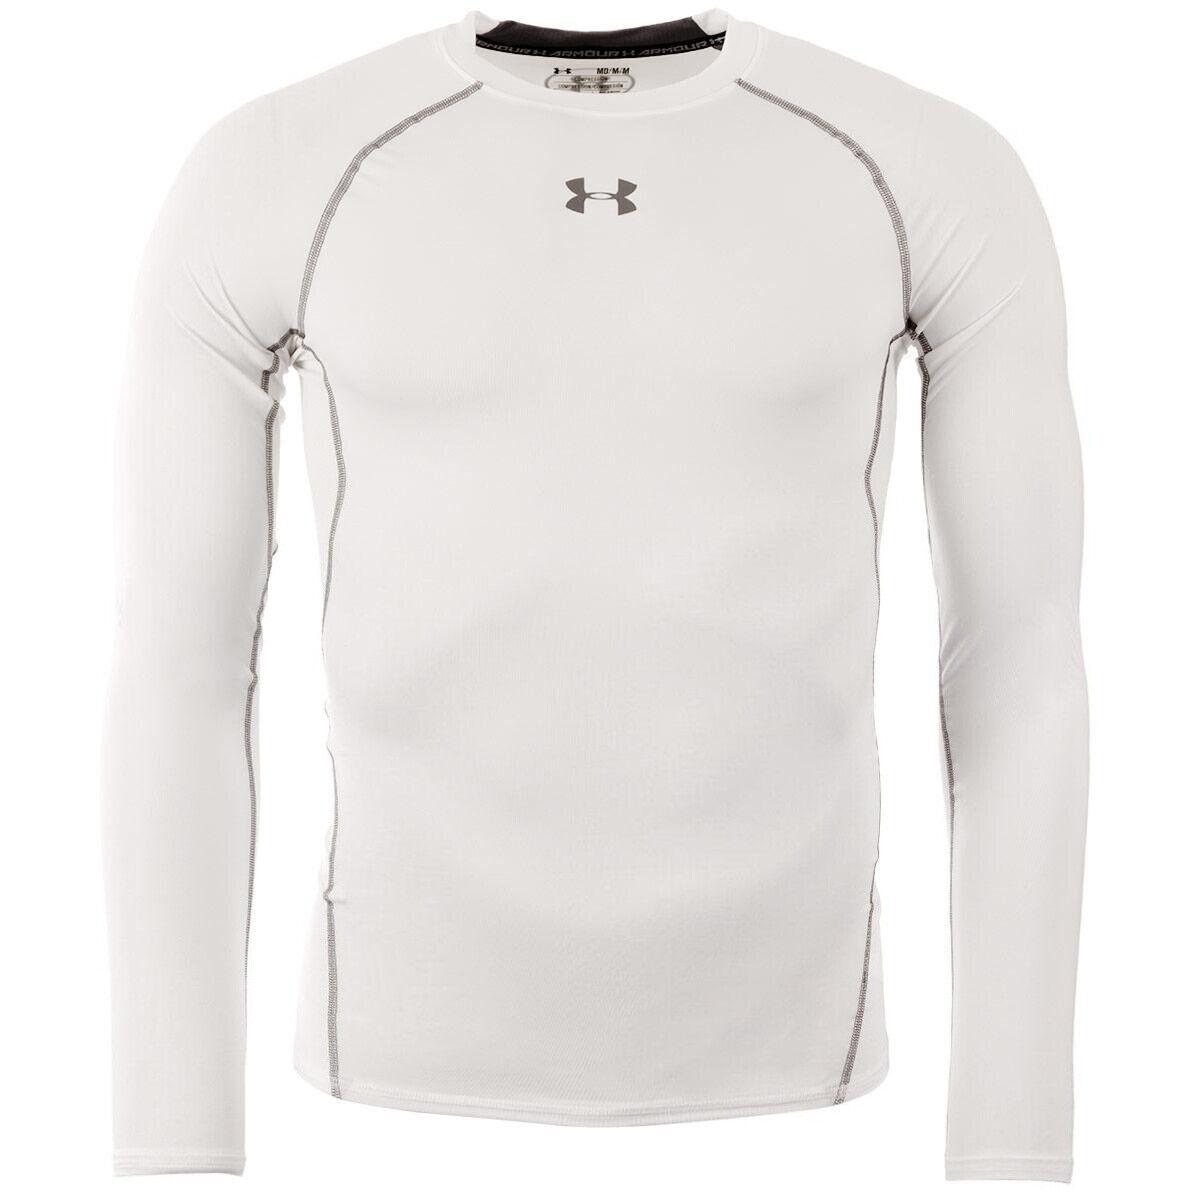 1257471-100 Mens Under Armour HeatGear Armour Long Sleeve Compression Shirt